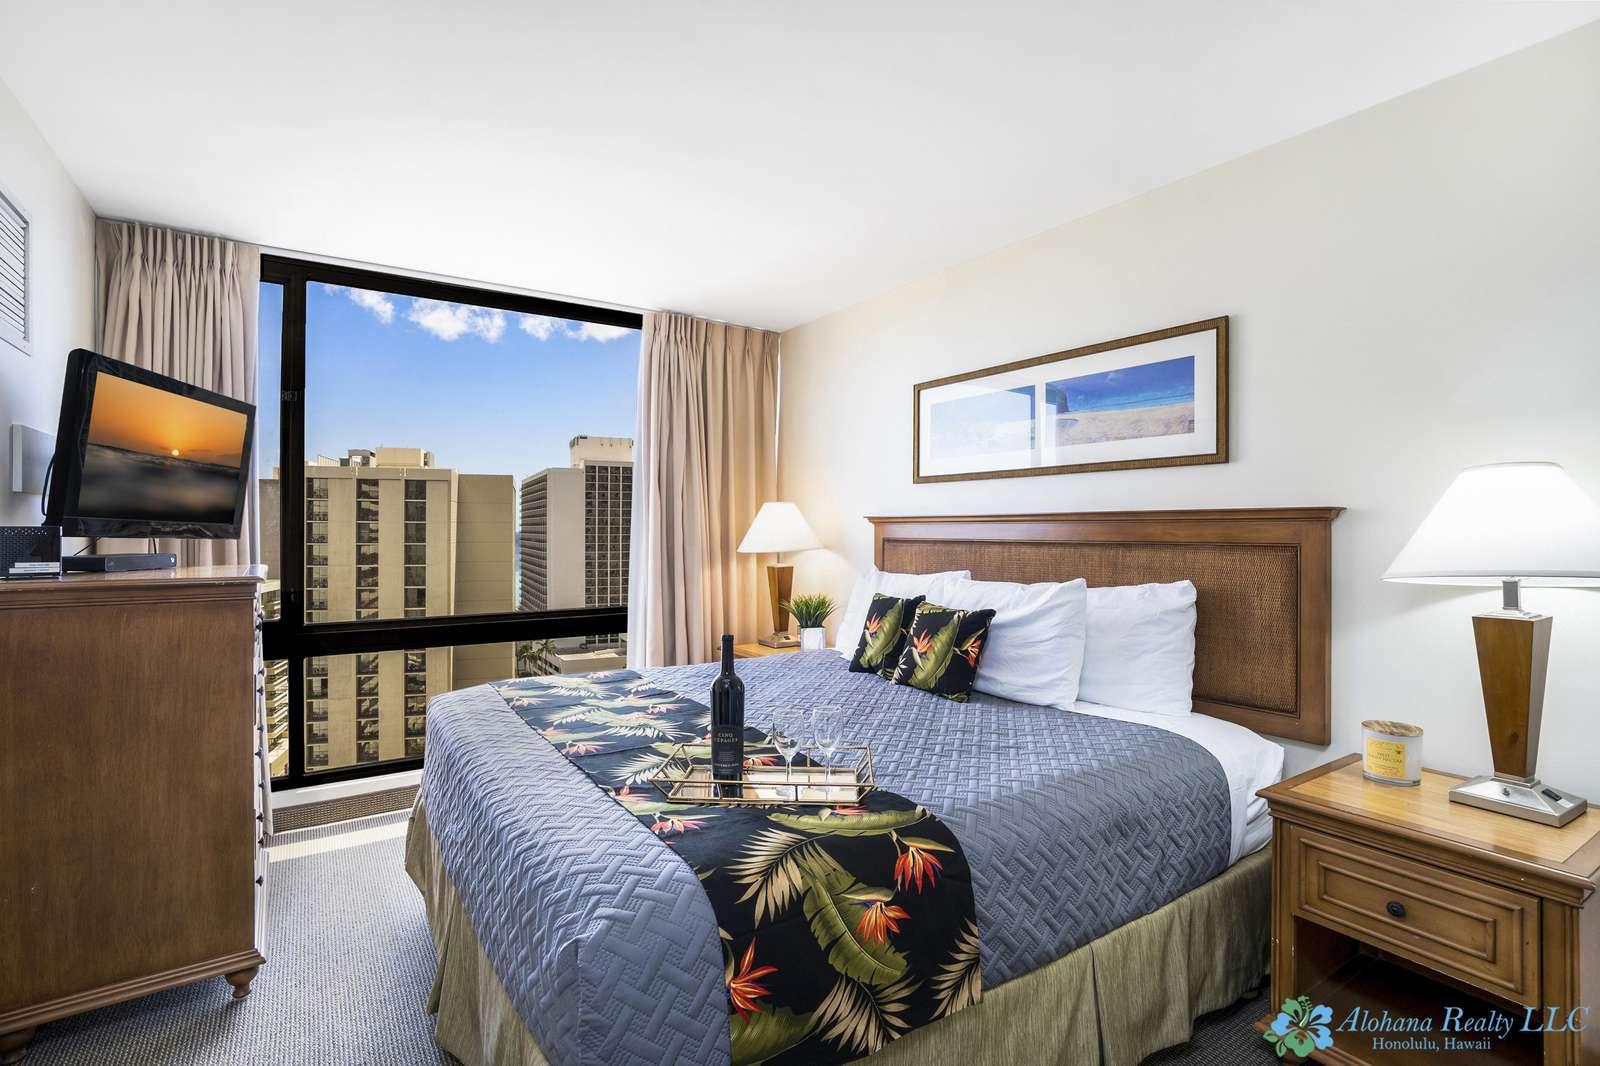 Ocean & Diamondhead View 1 bedroom at the Waikiki Sunset